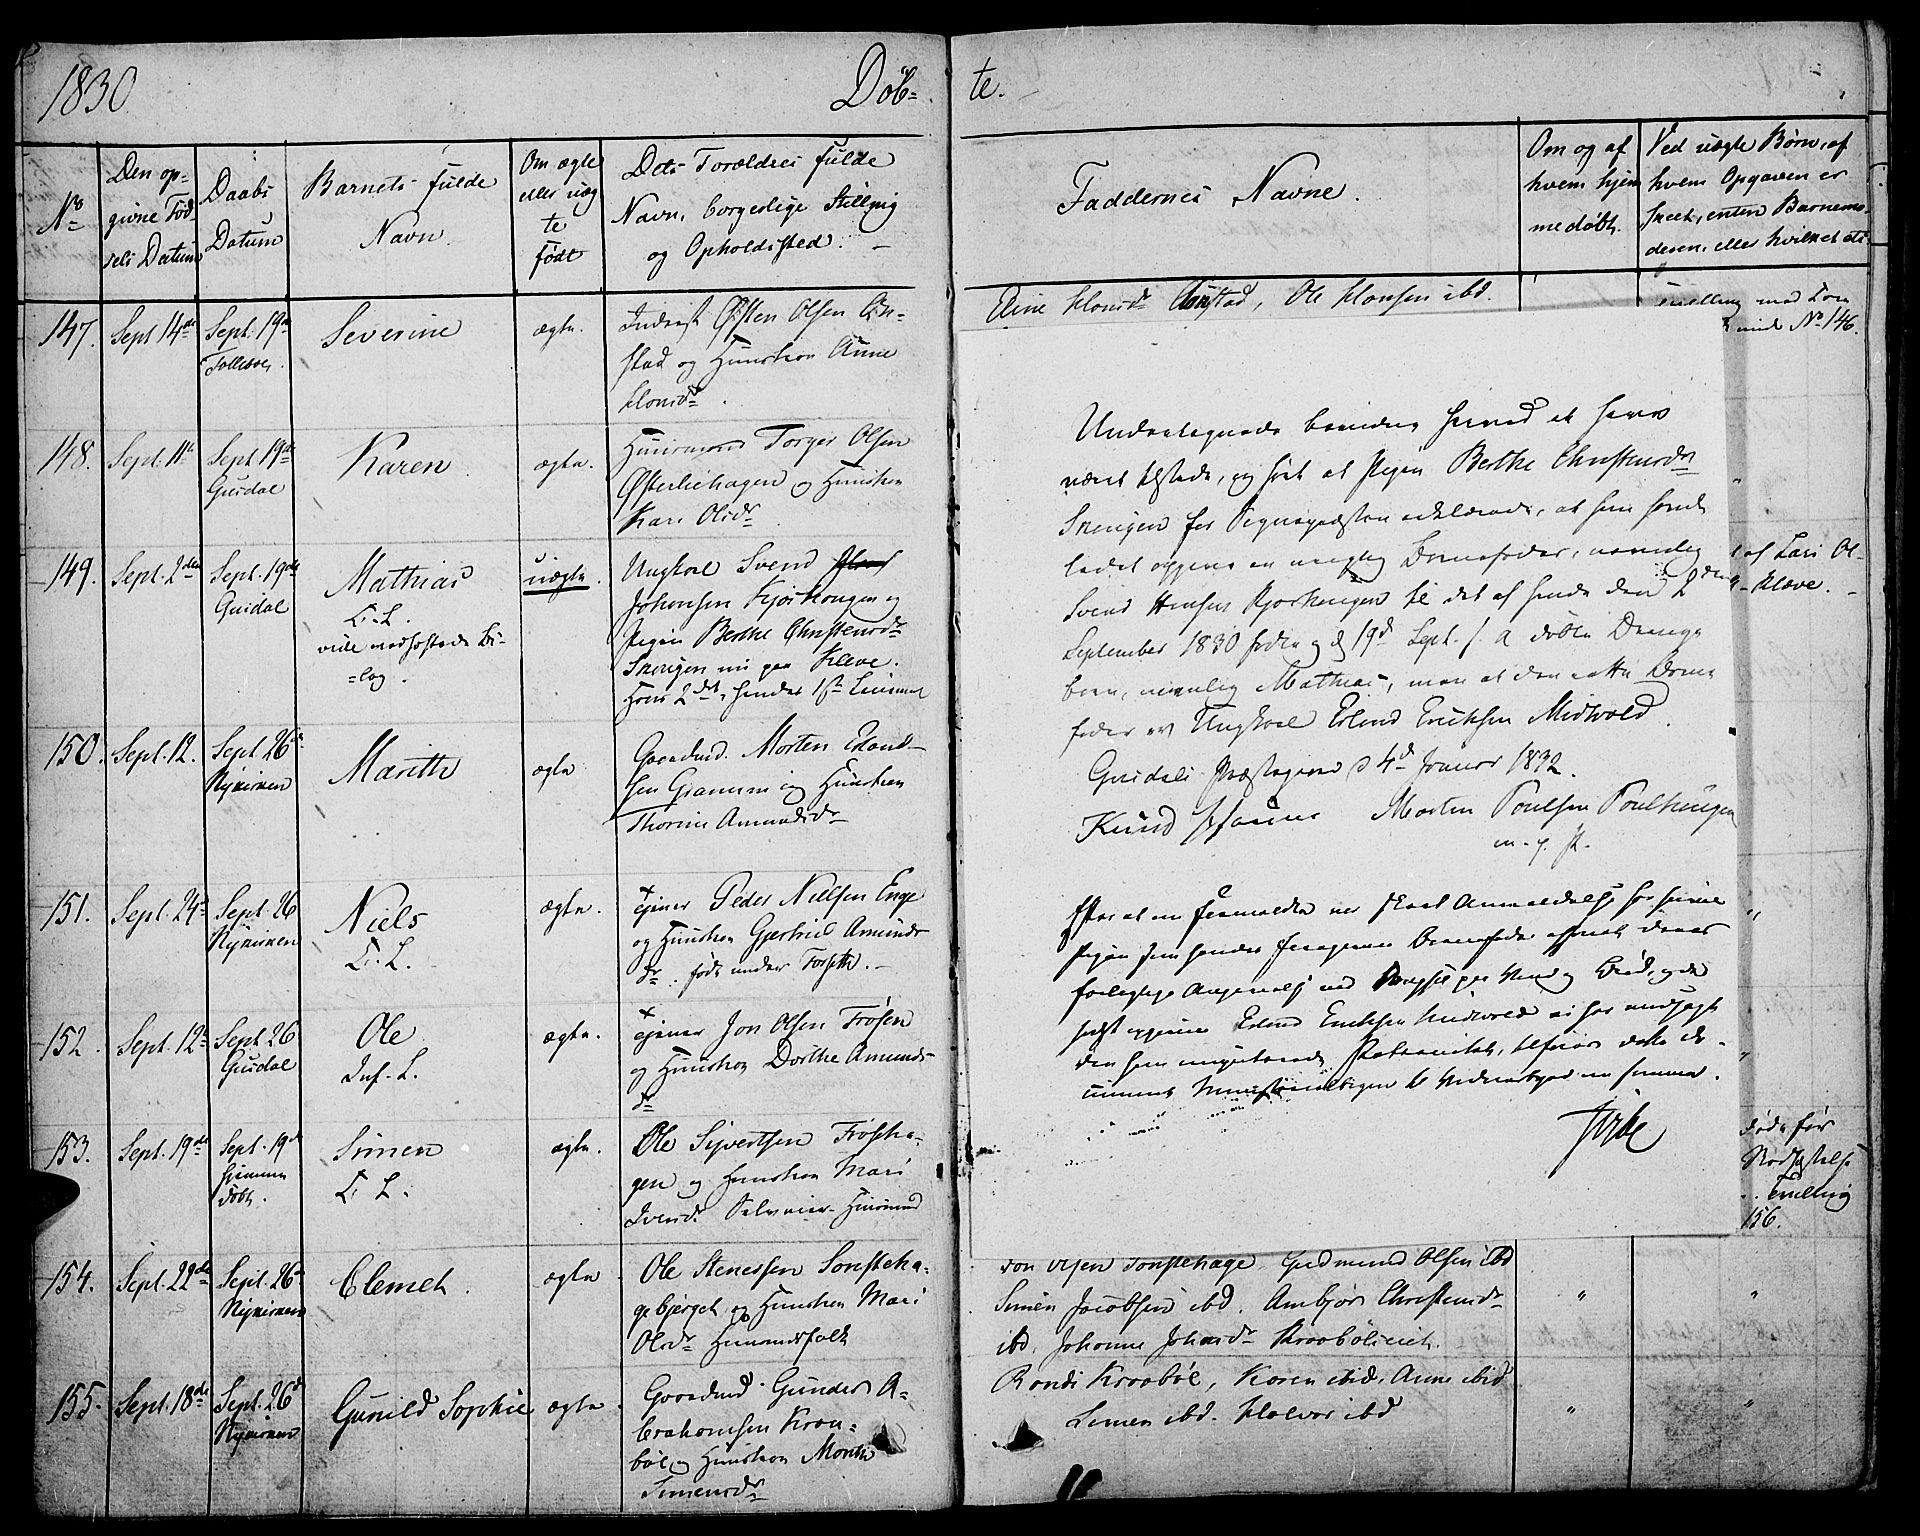 SAH, Gausdal prestekontor, Ministerialbok nr. 6, 1830-1839, s. 9b